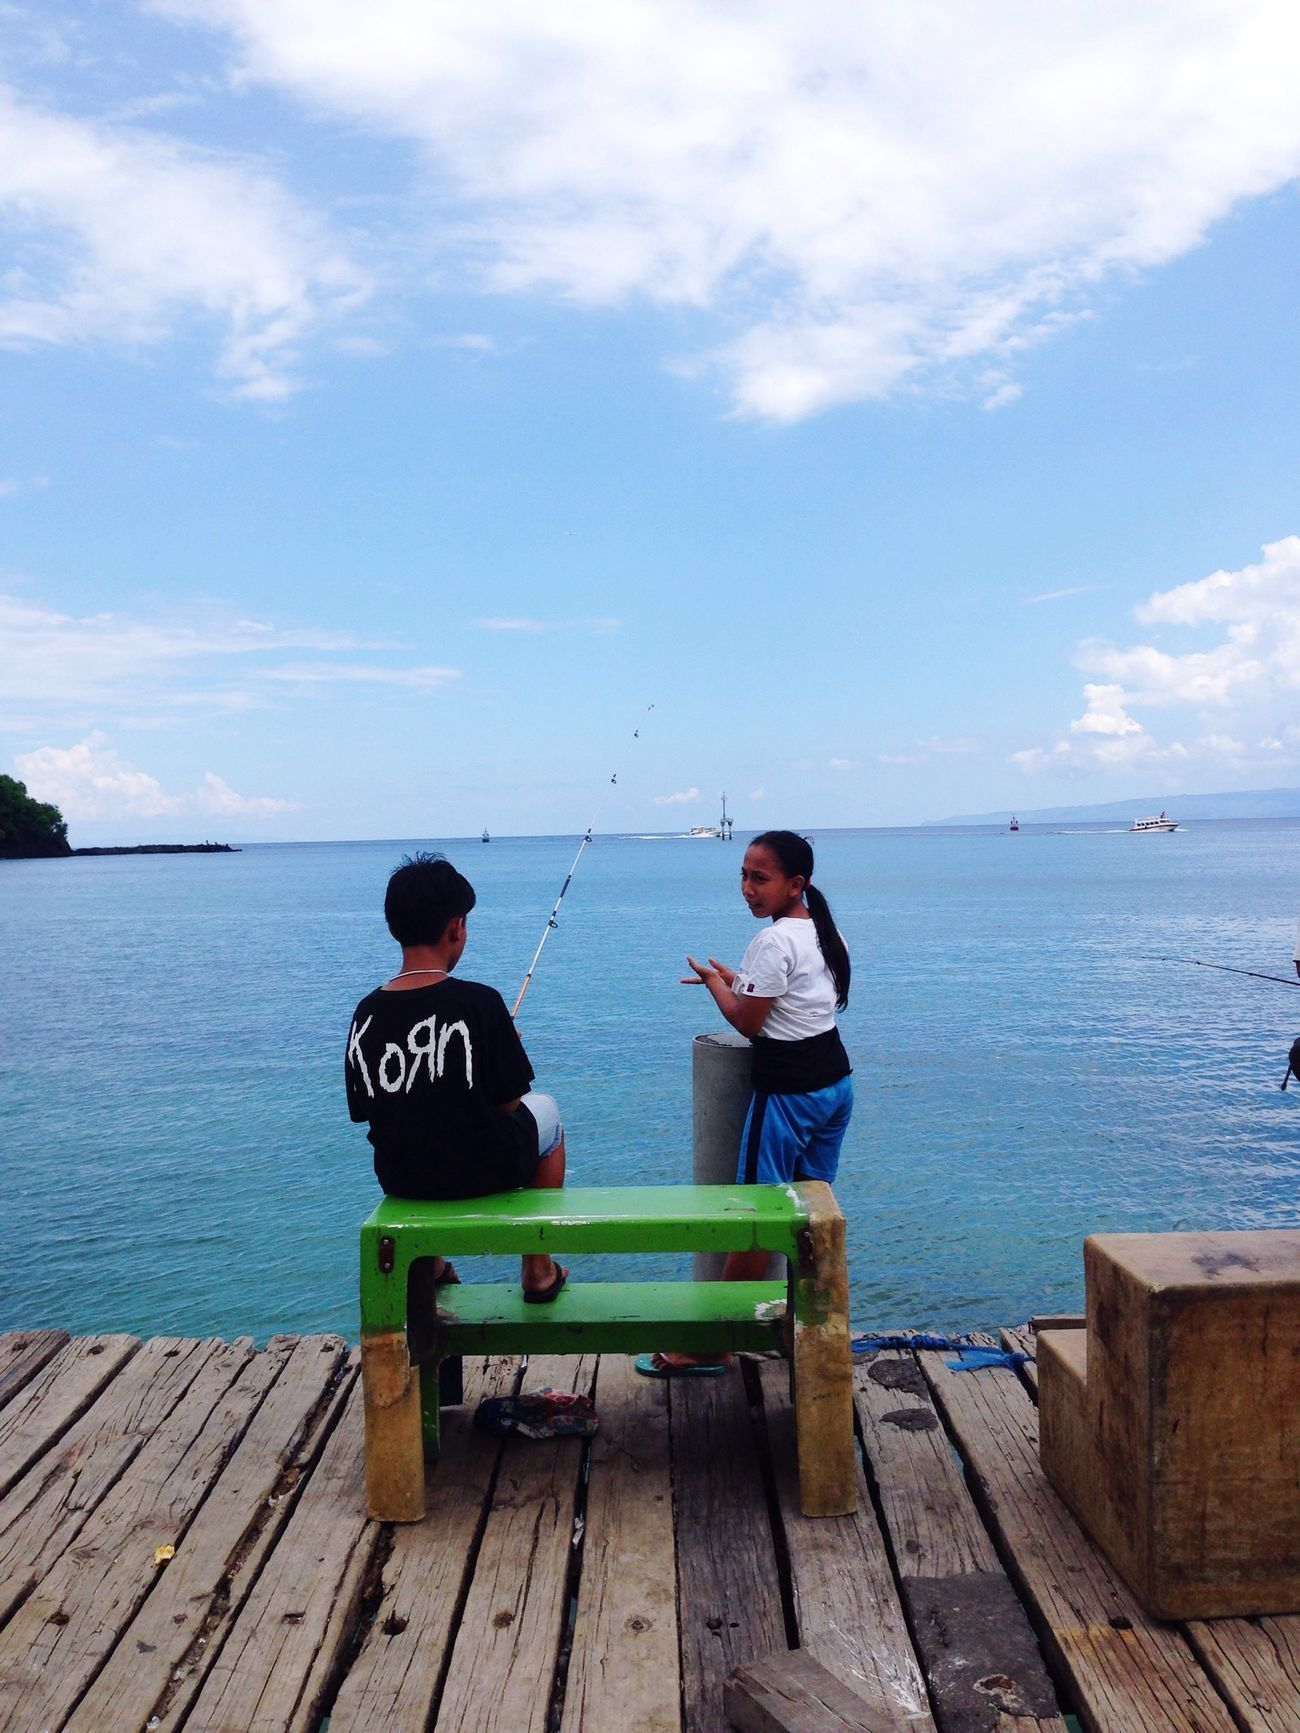 Bali INDONESIA Kids Fishing Harbour Korn Metal Sea